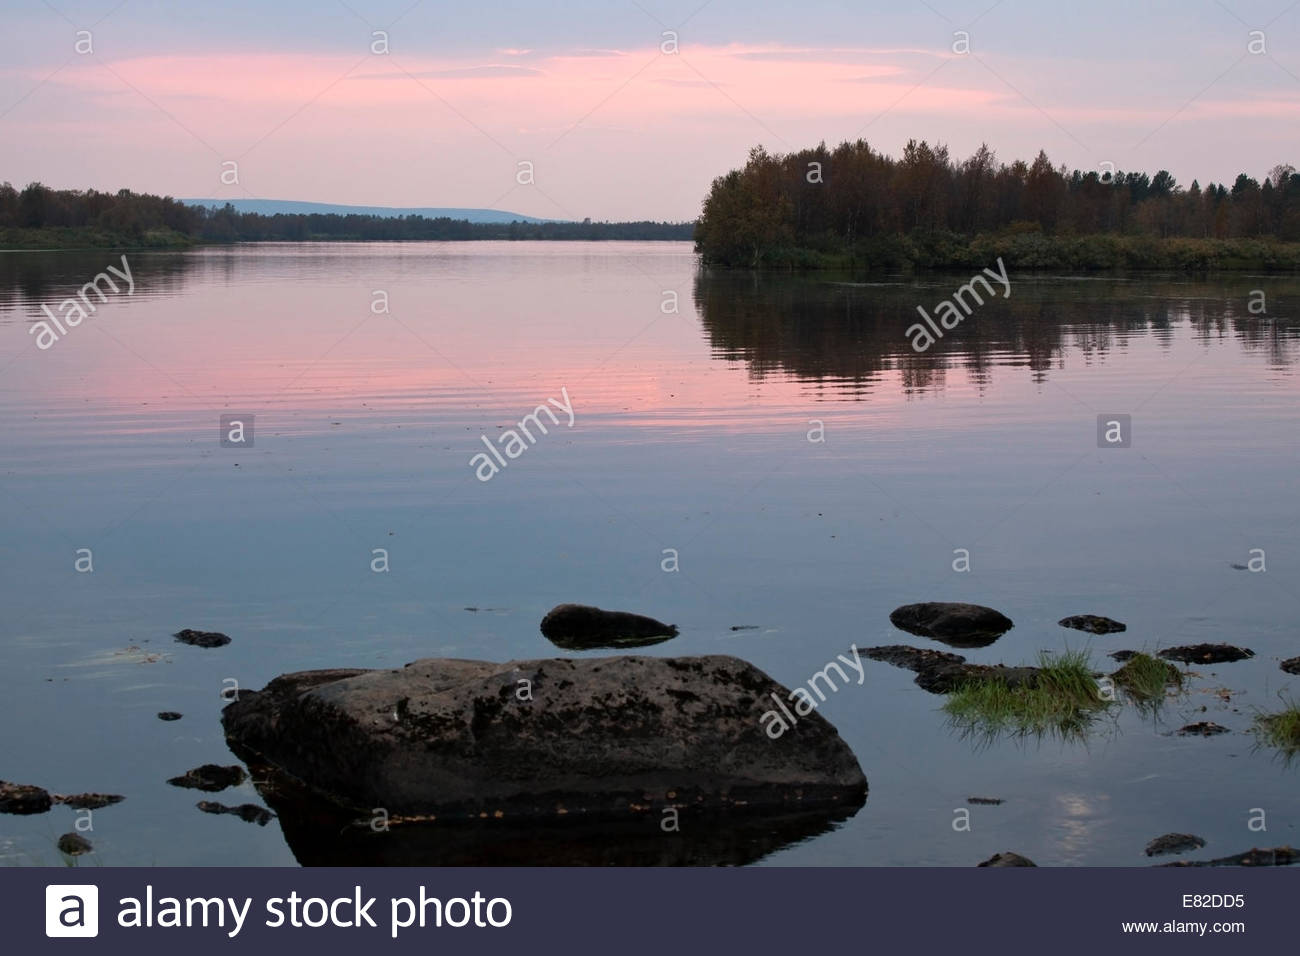 Beautiful sunset at Lapland Finland - Stock Image